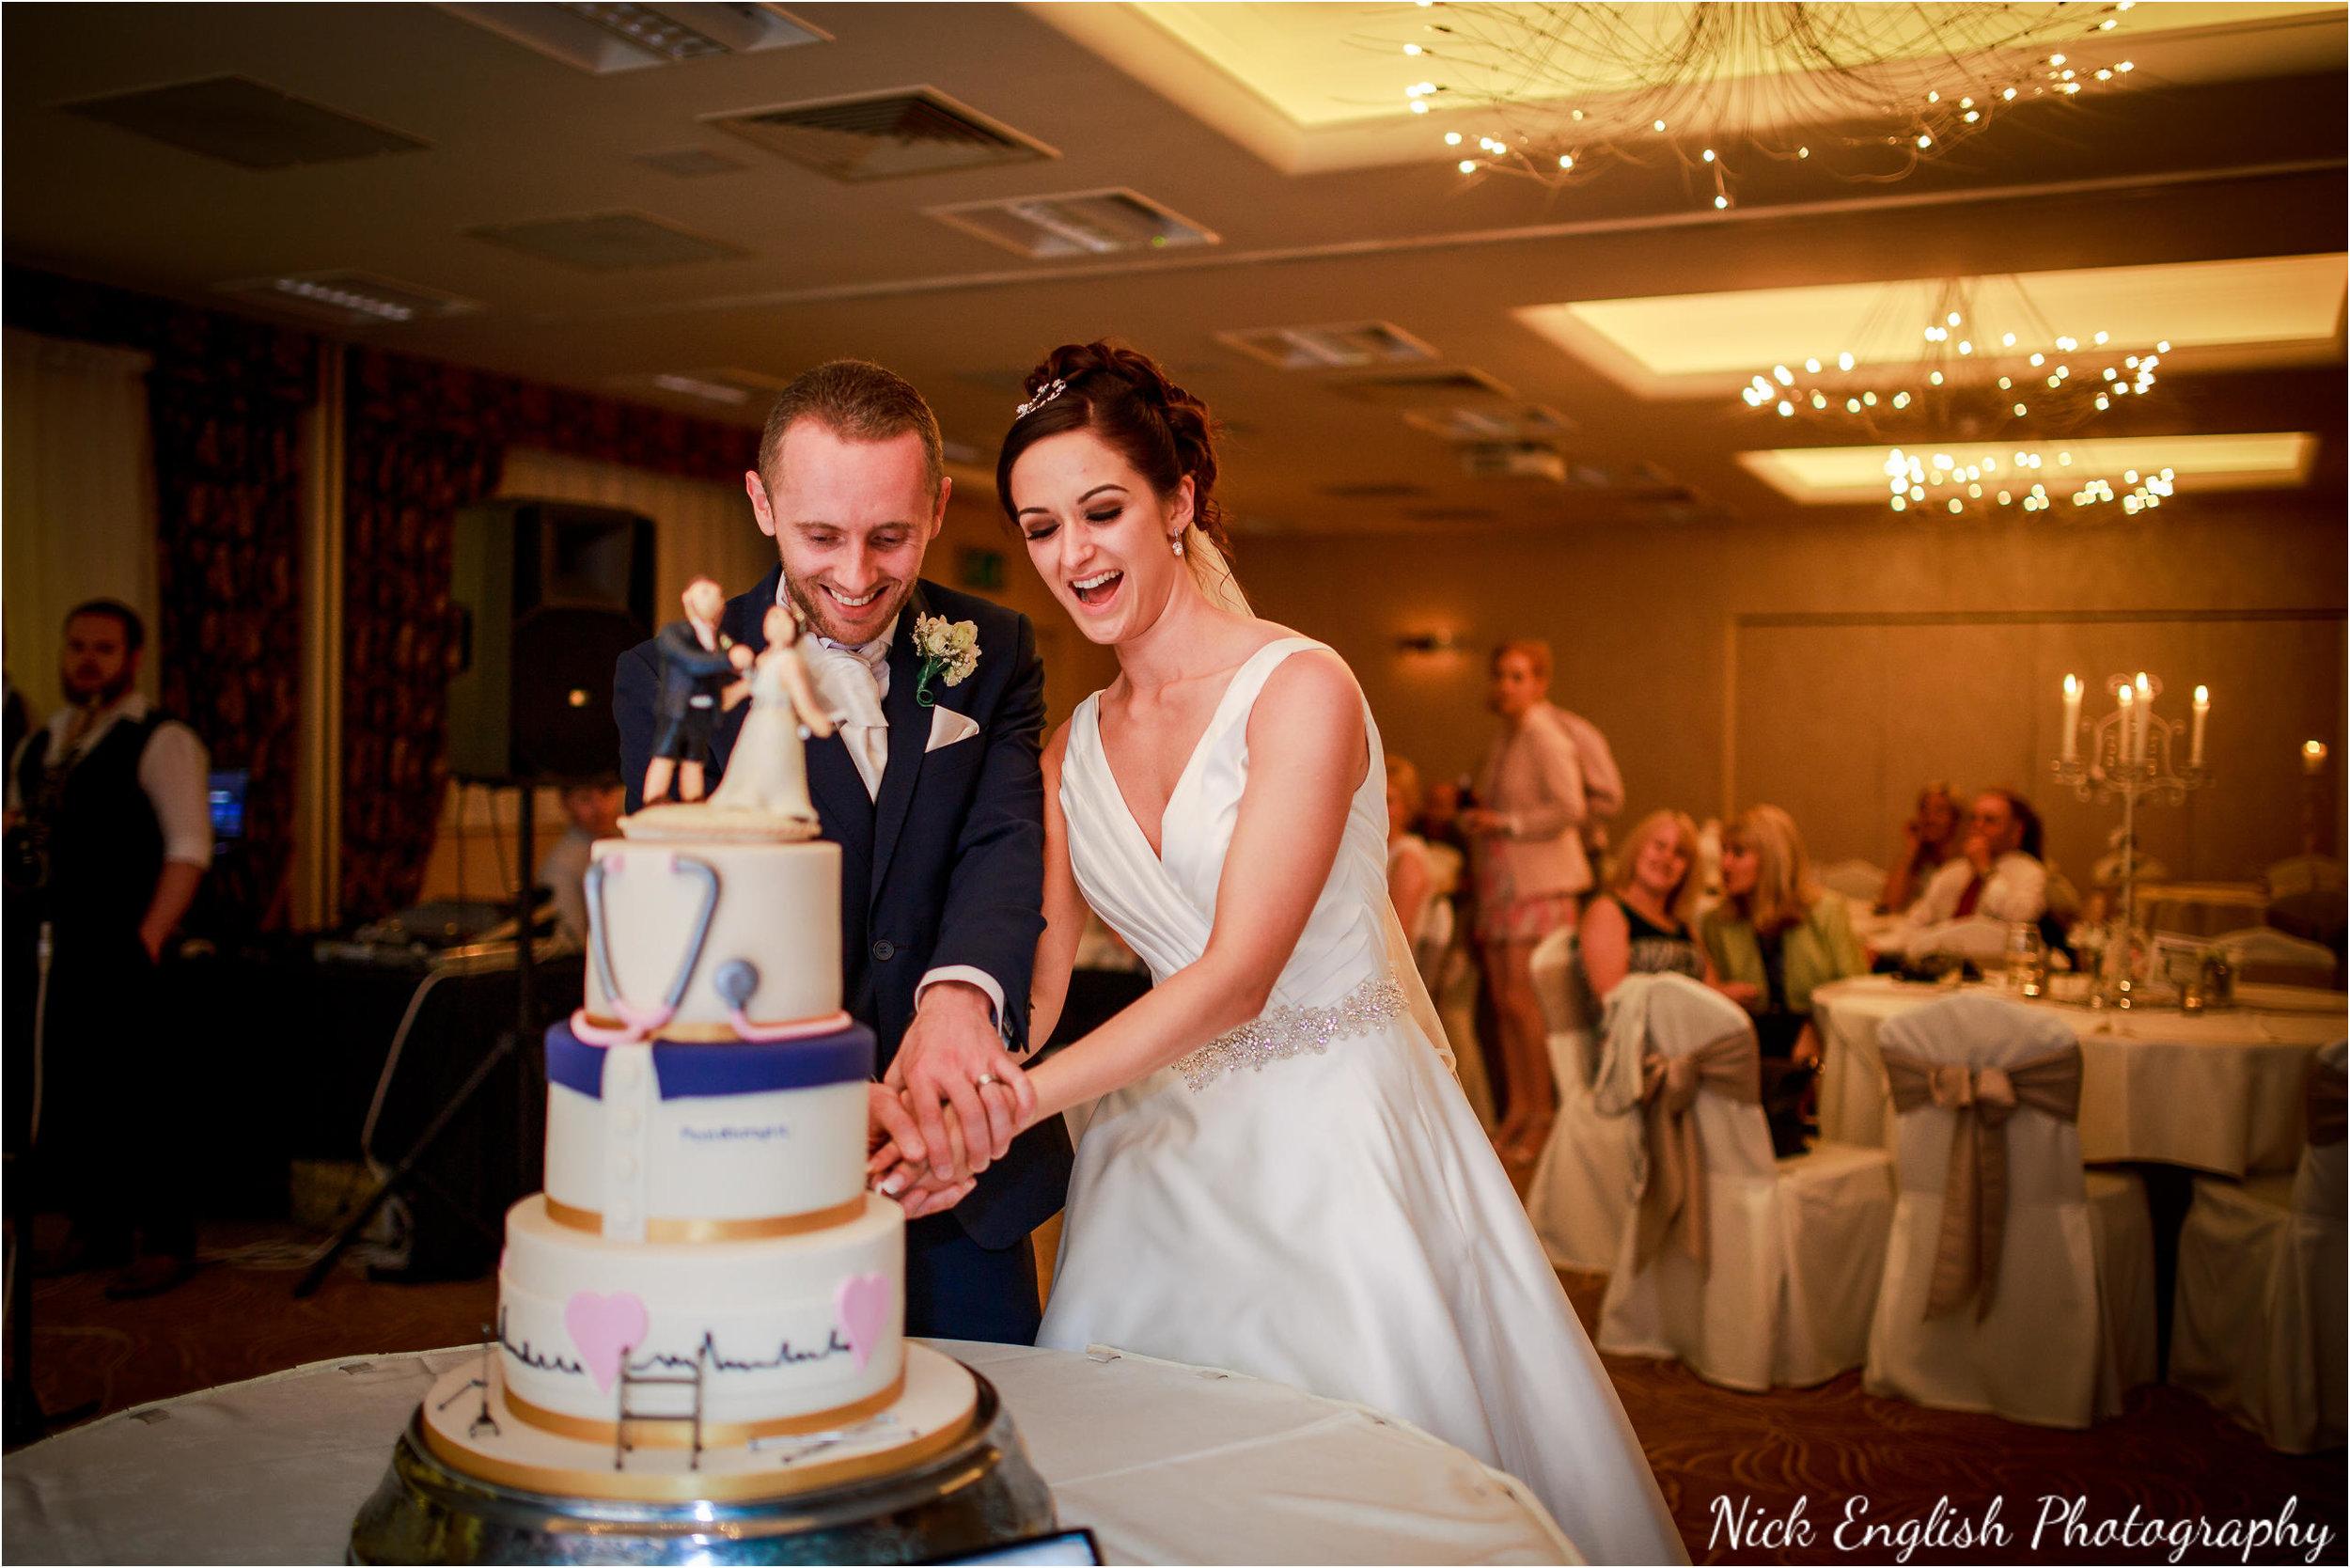 Emily David Wedding Photographs at Barton Grange Preston by Nick English Photography 220jpg.jpeg